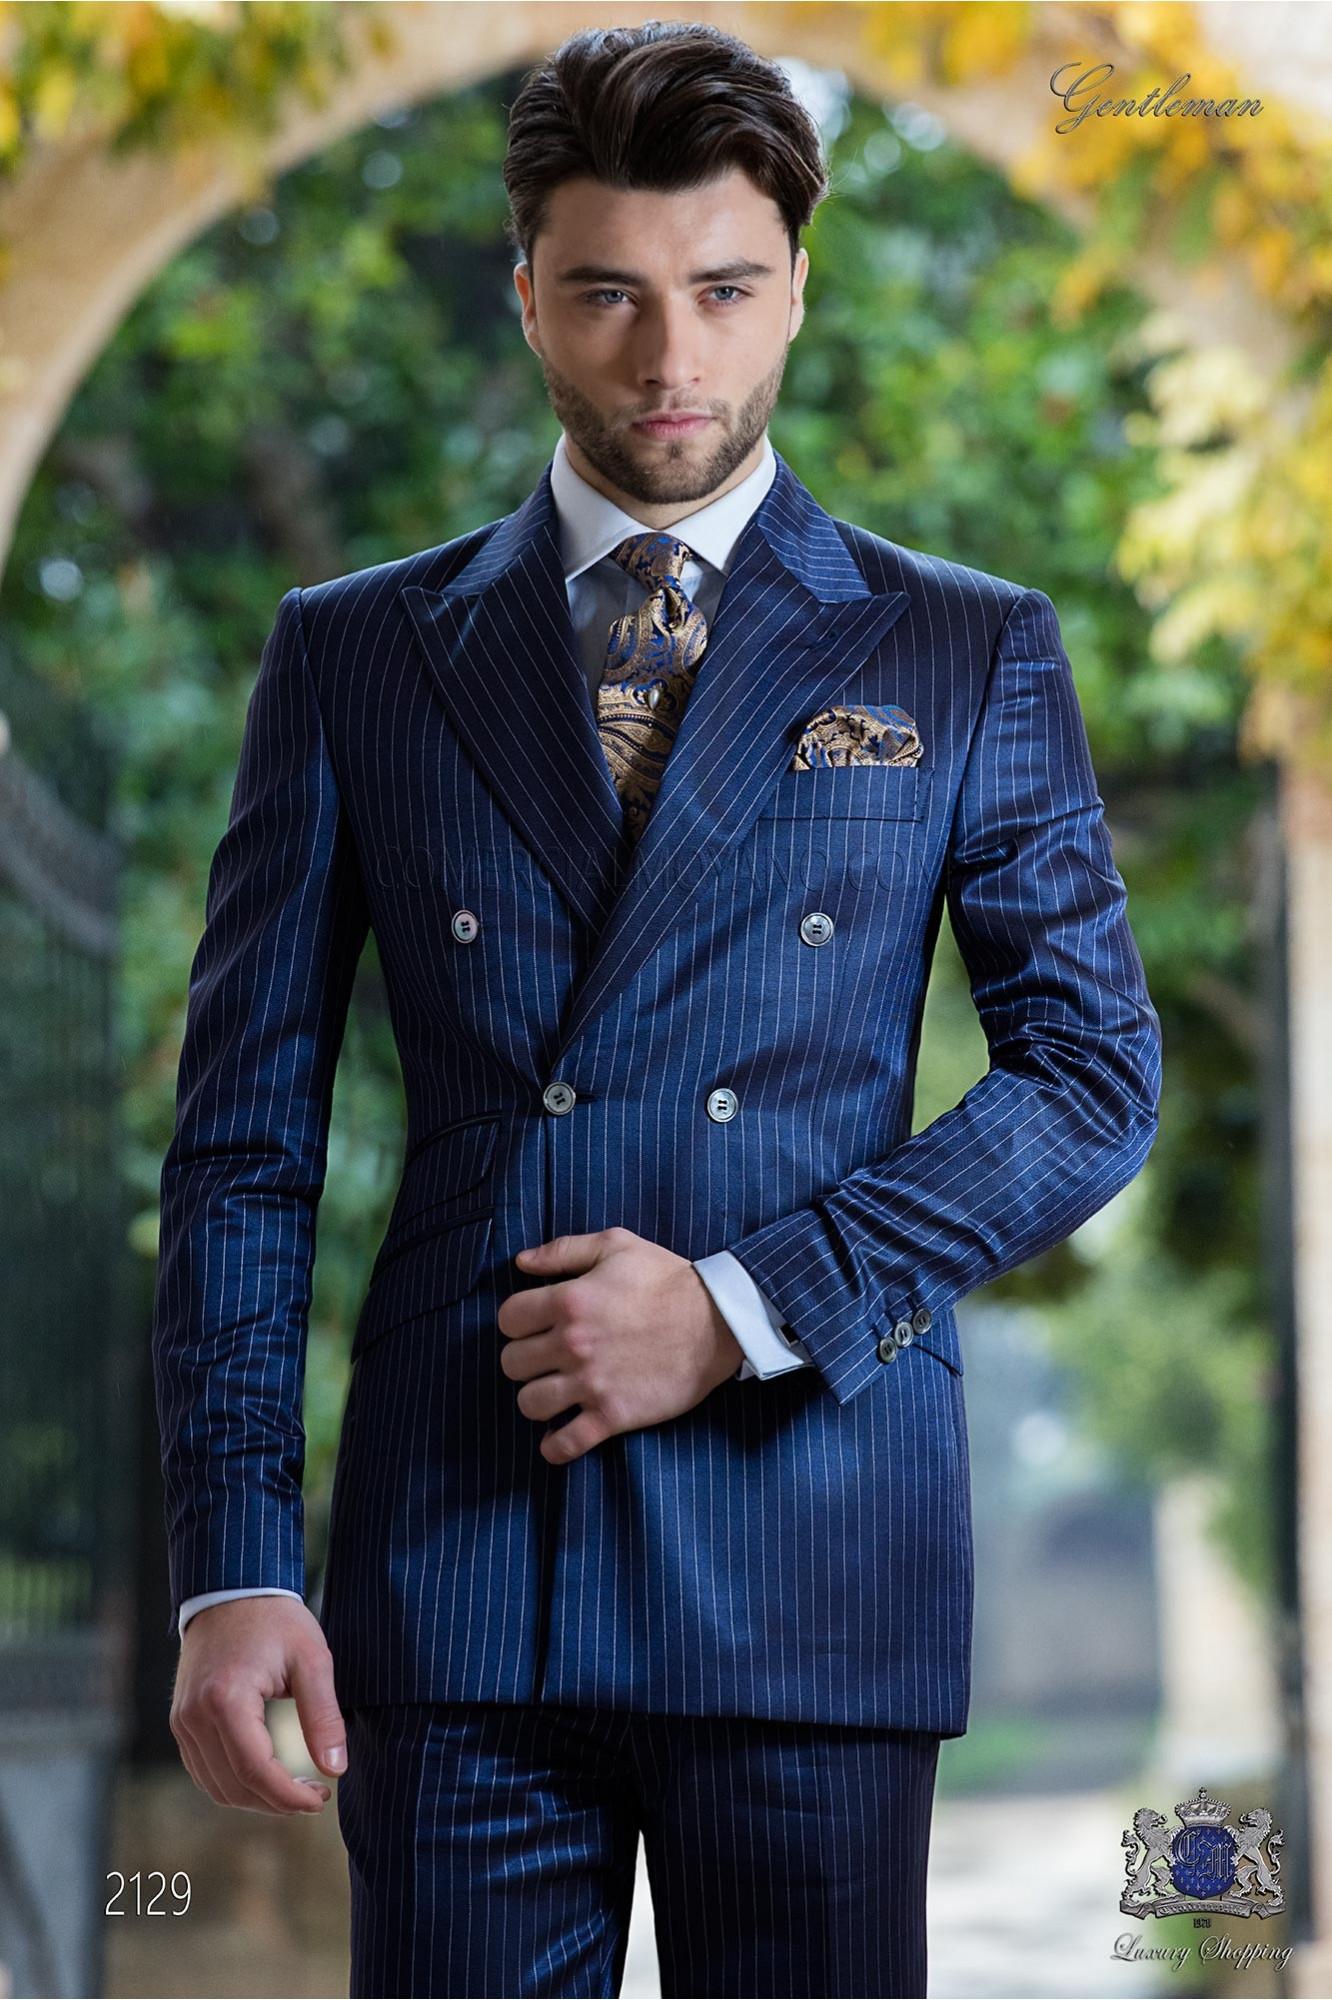 bespoke suit double breasted blue pinstripe ottavio nuccio. Black Bedroom Furniture Sets. Home Design Ideas